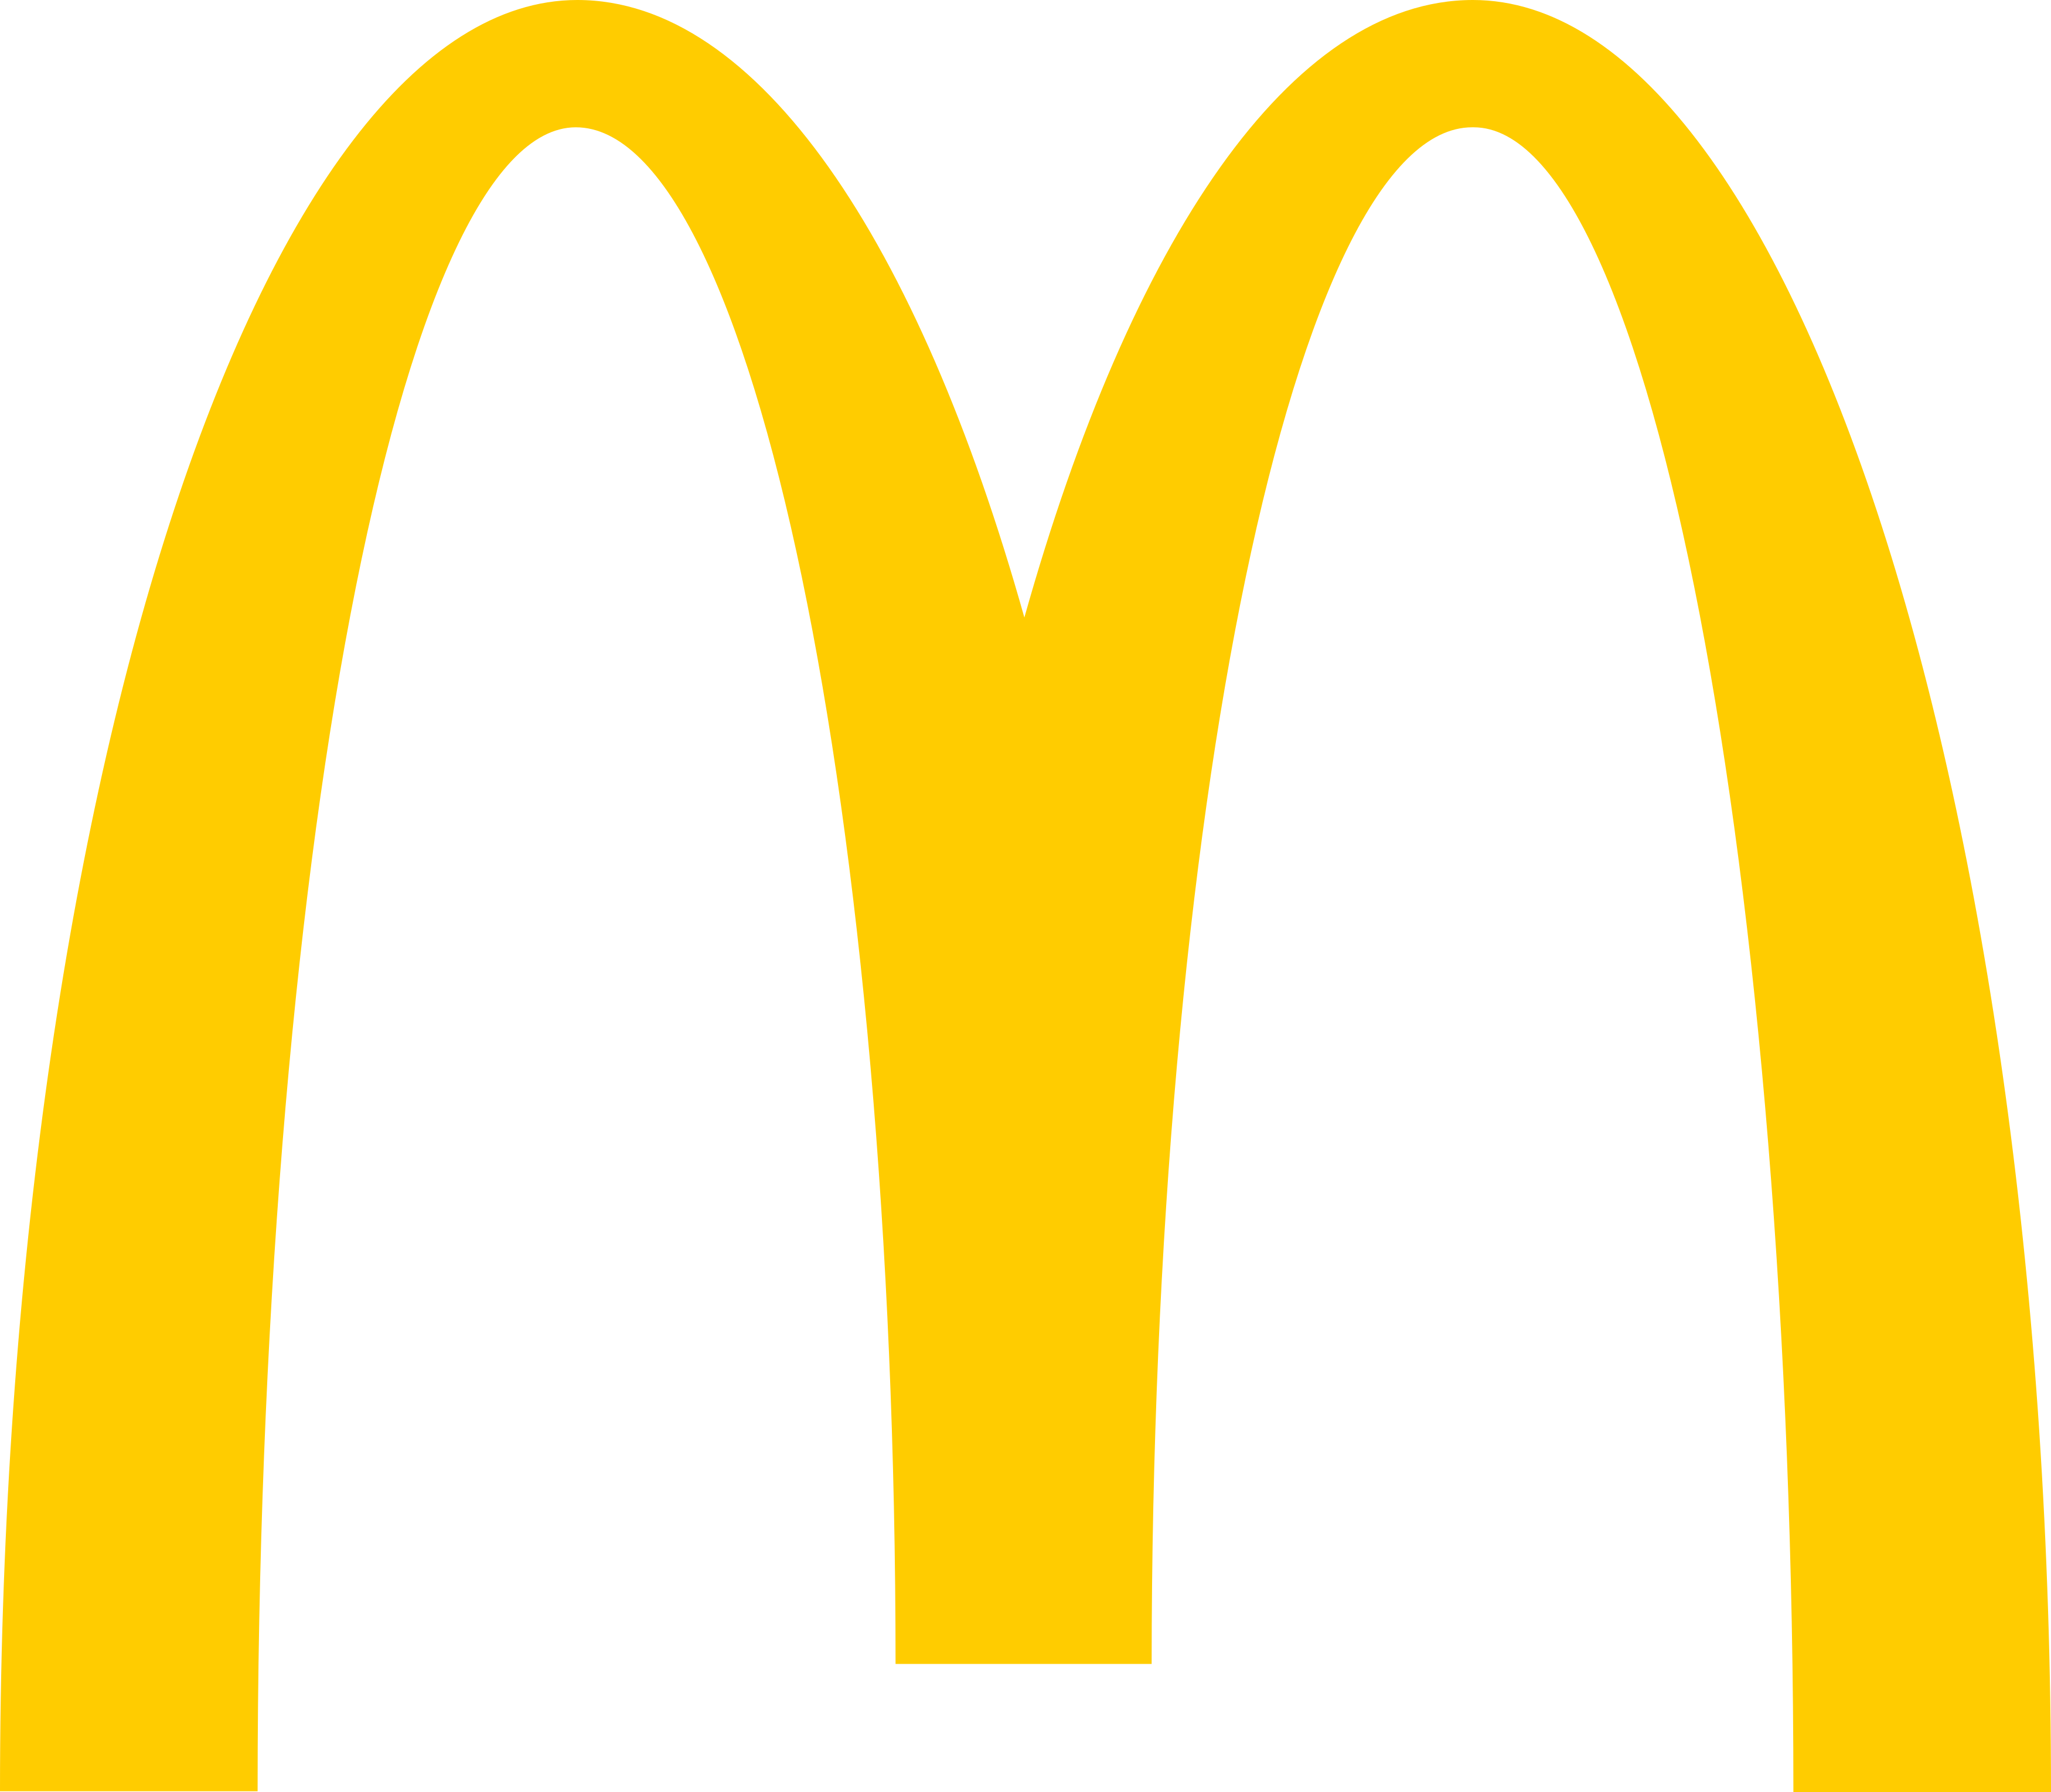 McDonalds logo 1 - McDonald's Logo